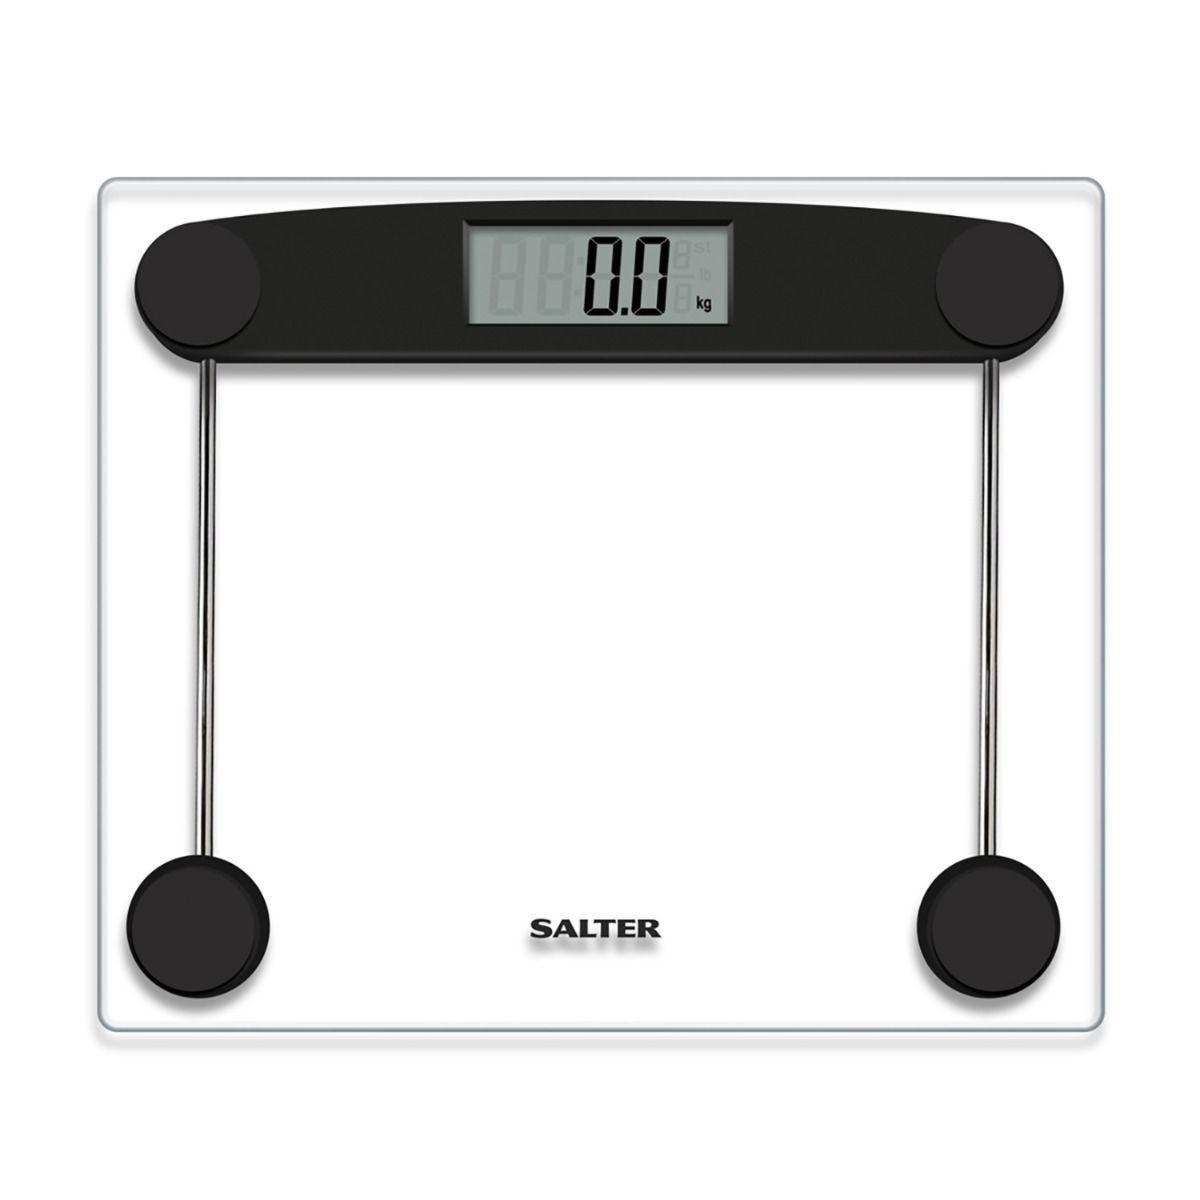 Salter Compact Glass Digital Bathroom Scale